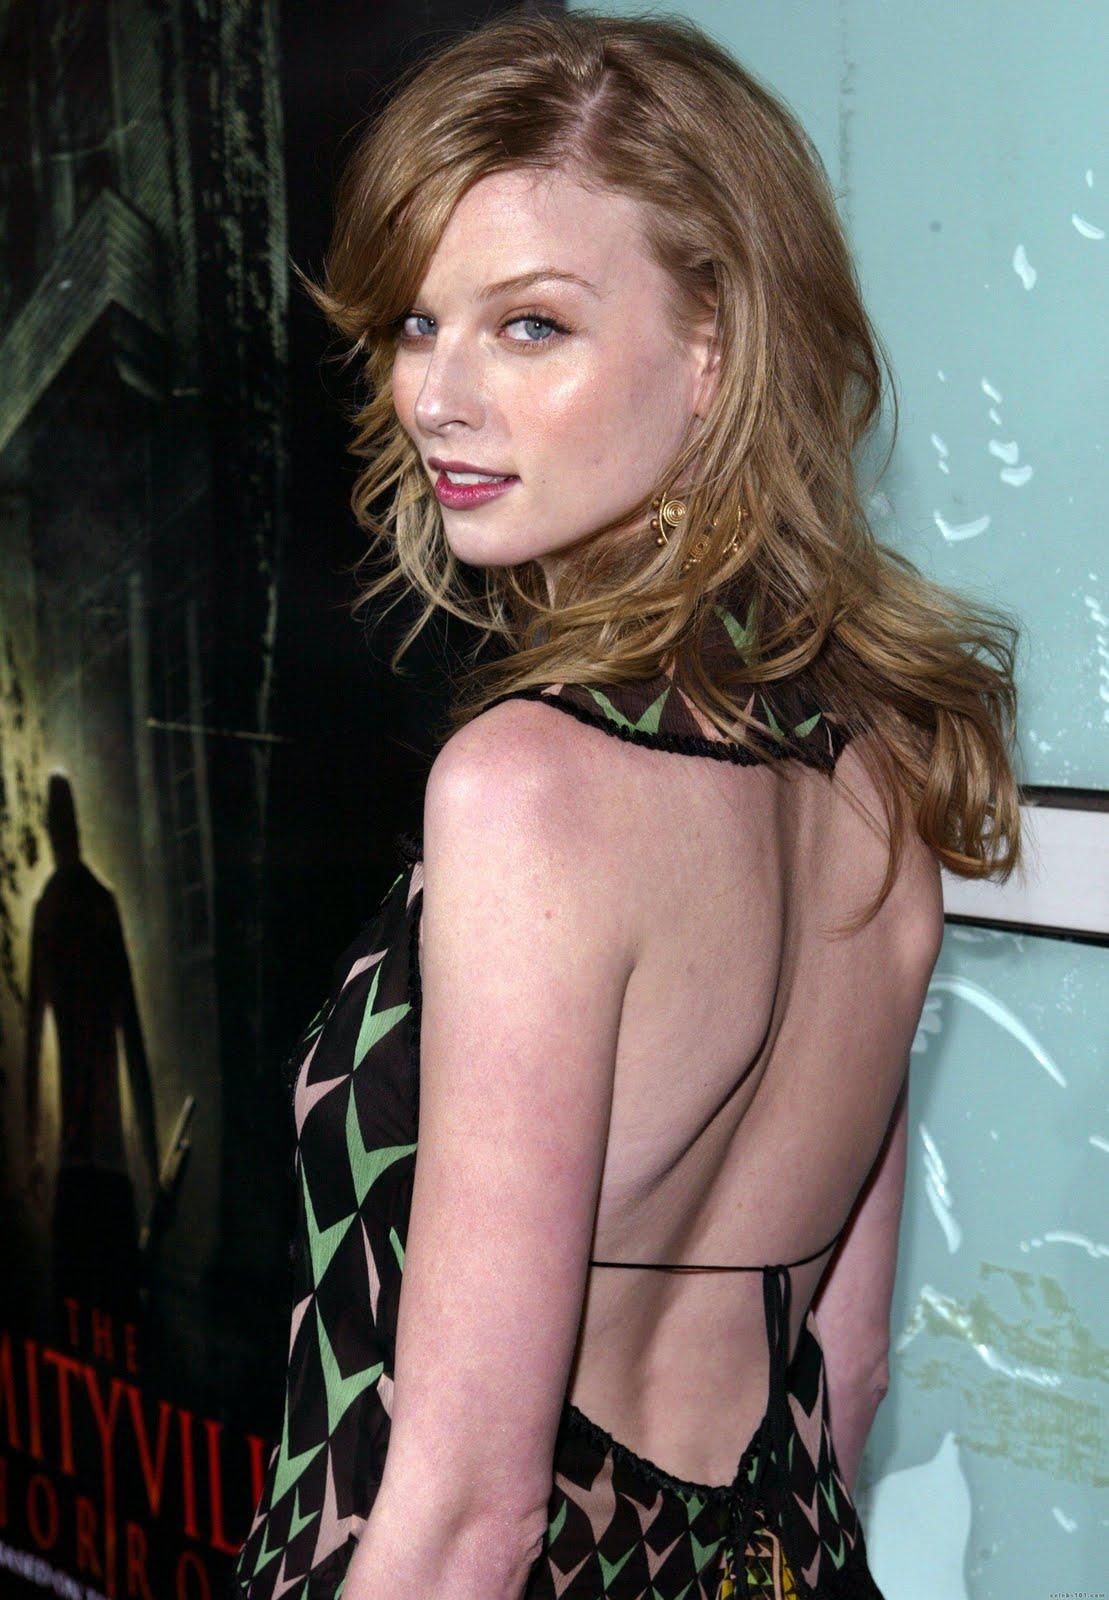 Actress rachel nichols hot right! like